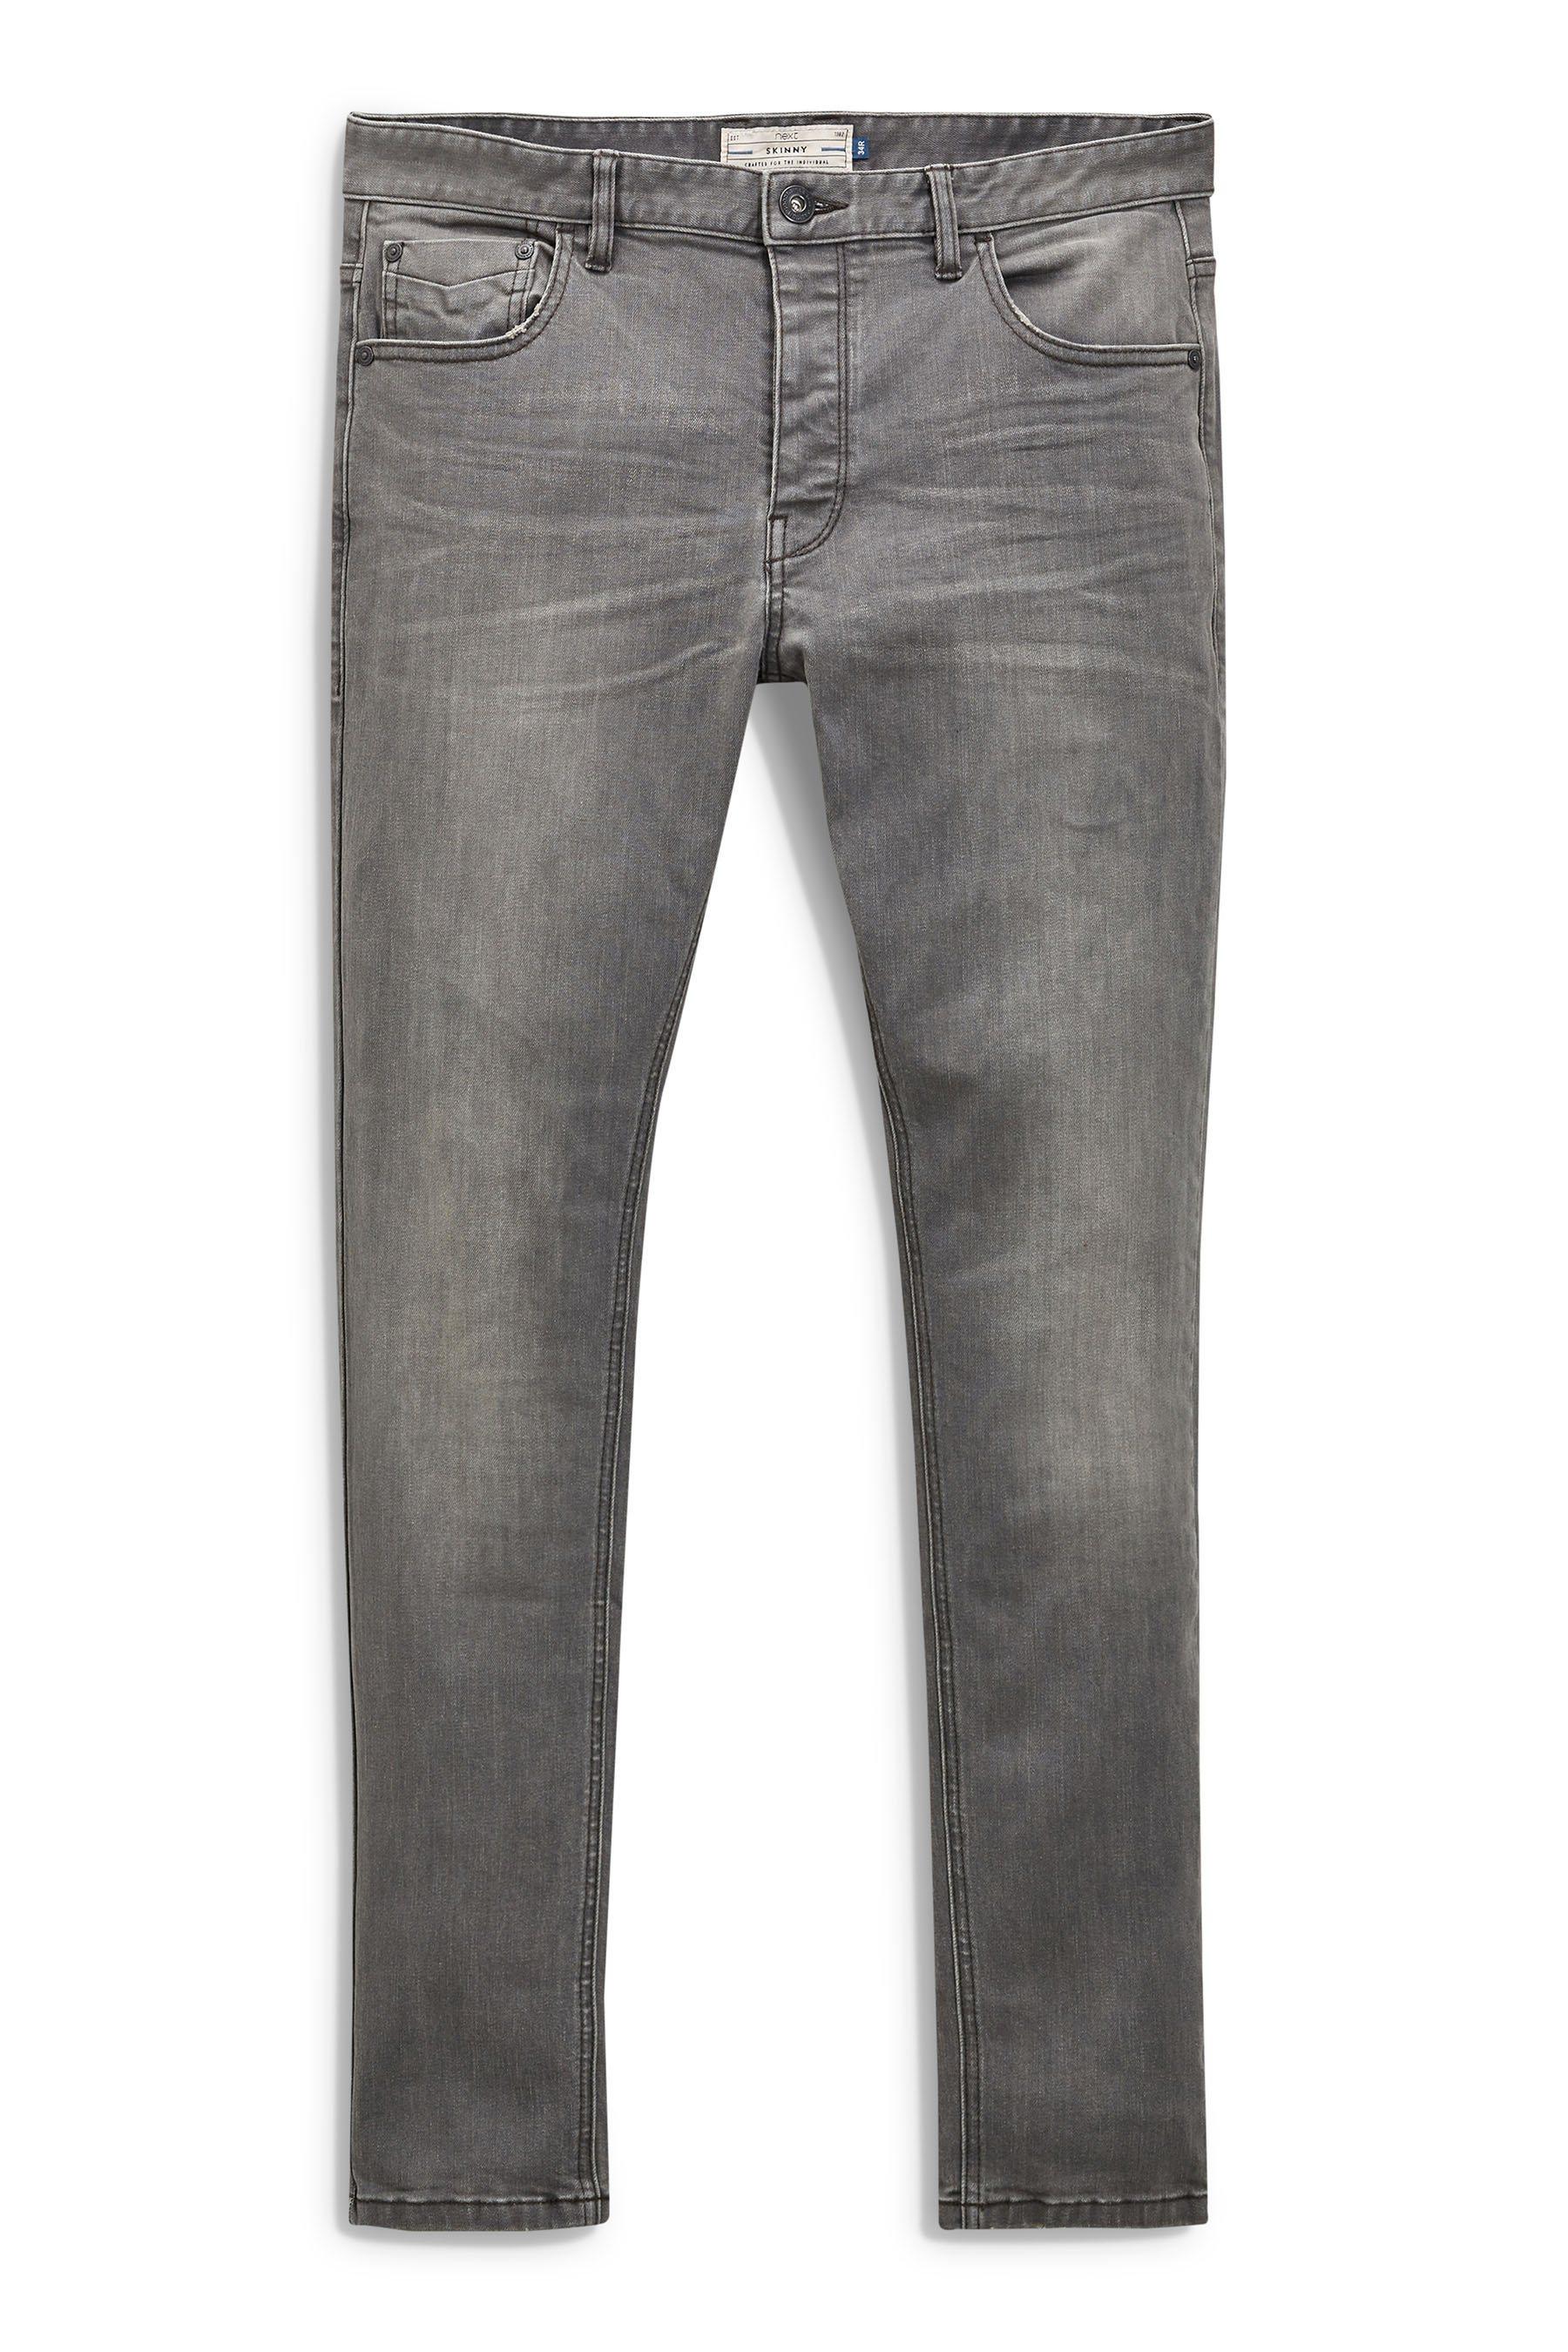 Next Slim-Fit Mid Grey Stretch-Jeans